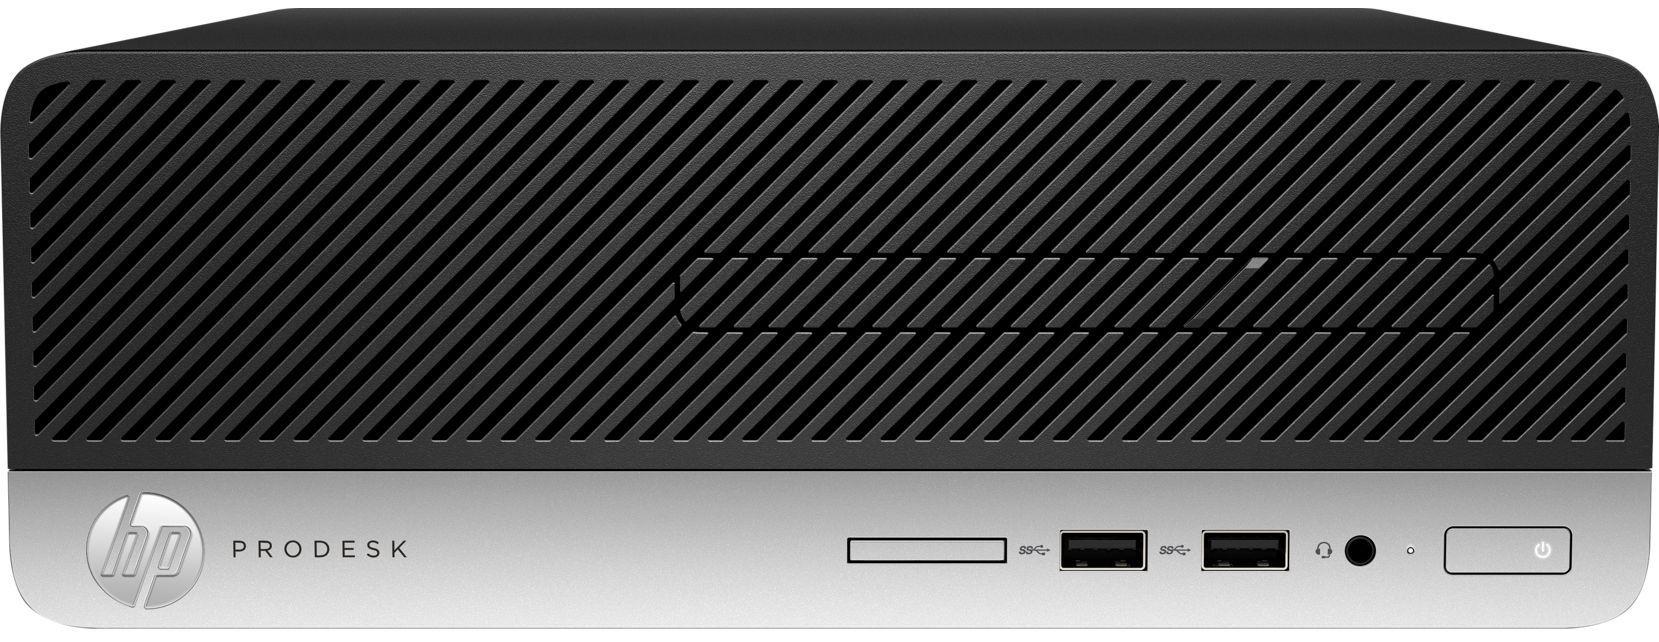 Настолен компютър HP ProDesk - 400 G6 SFF, черен - 1